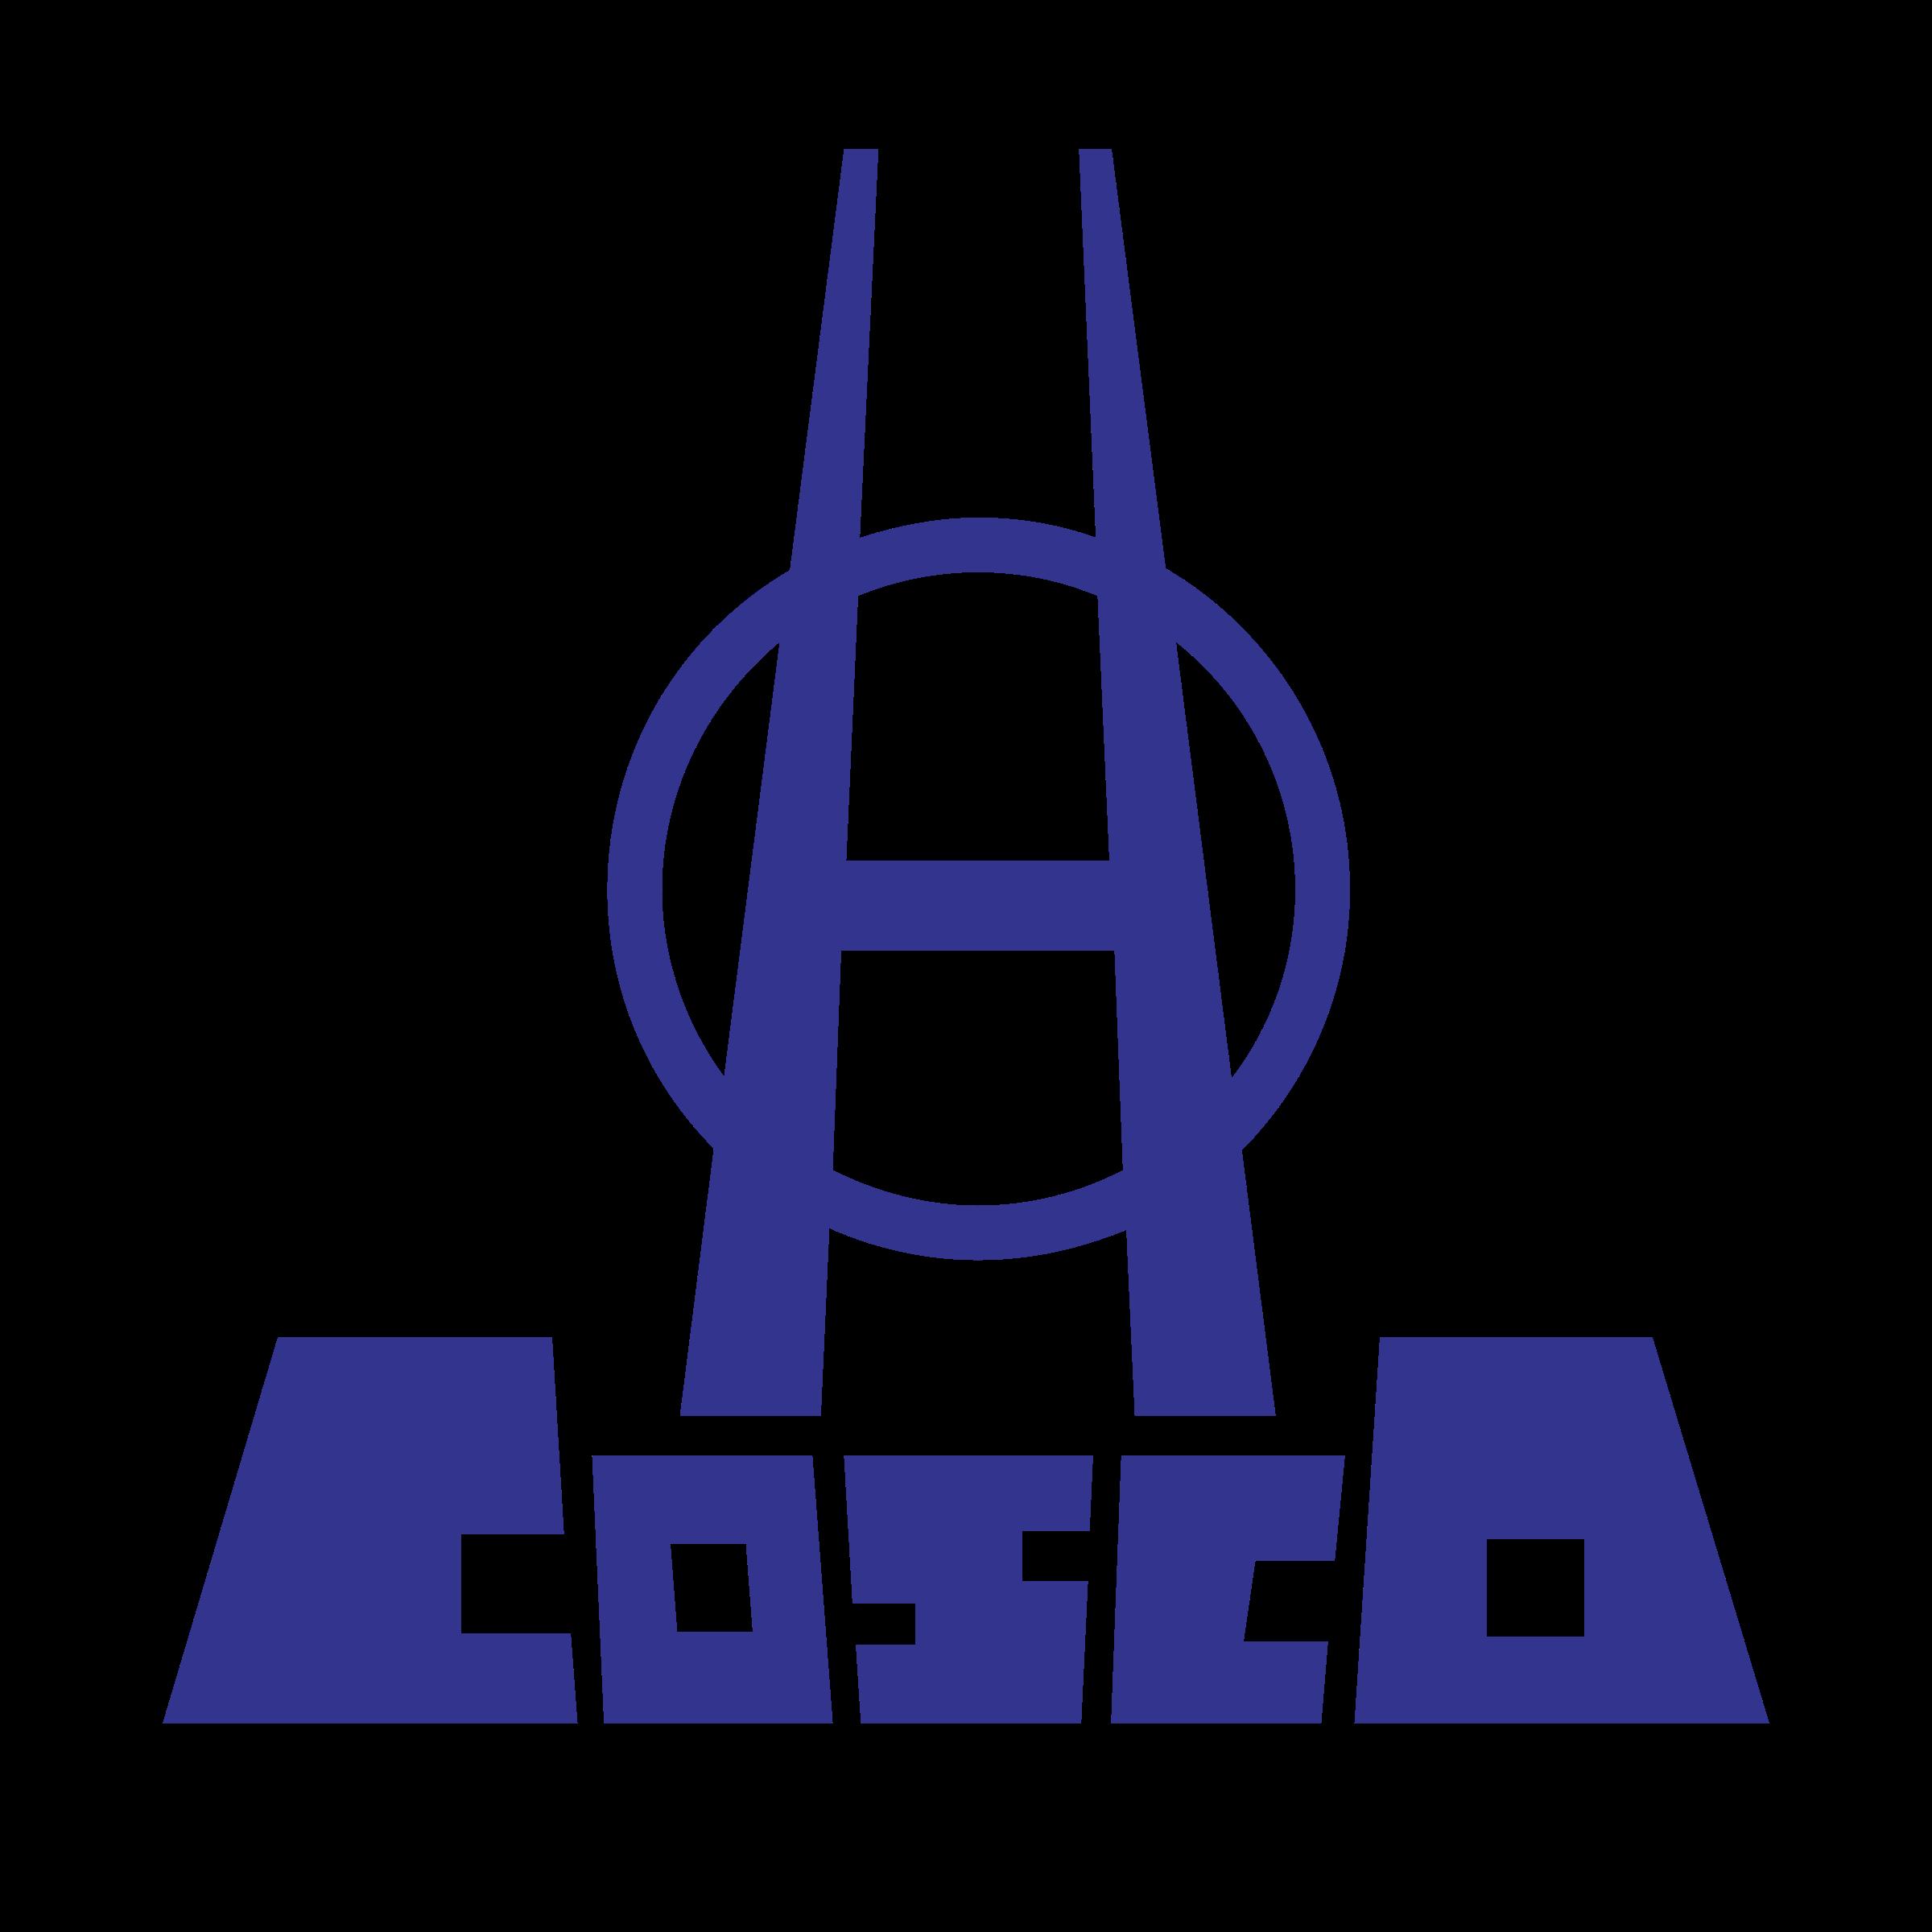 COSCO Logo PNG Transparent & SVG Vector.